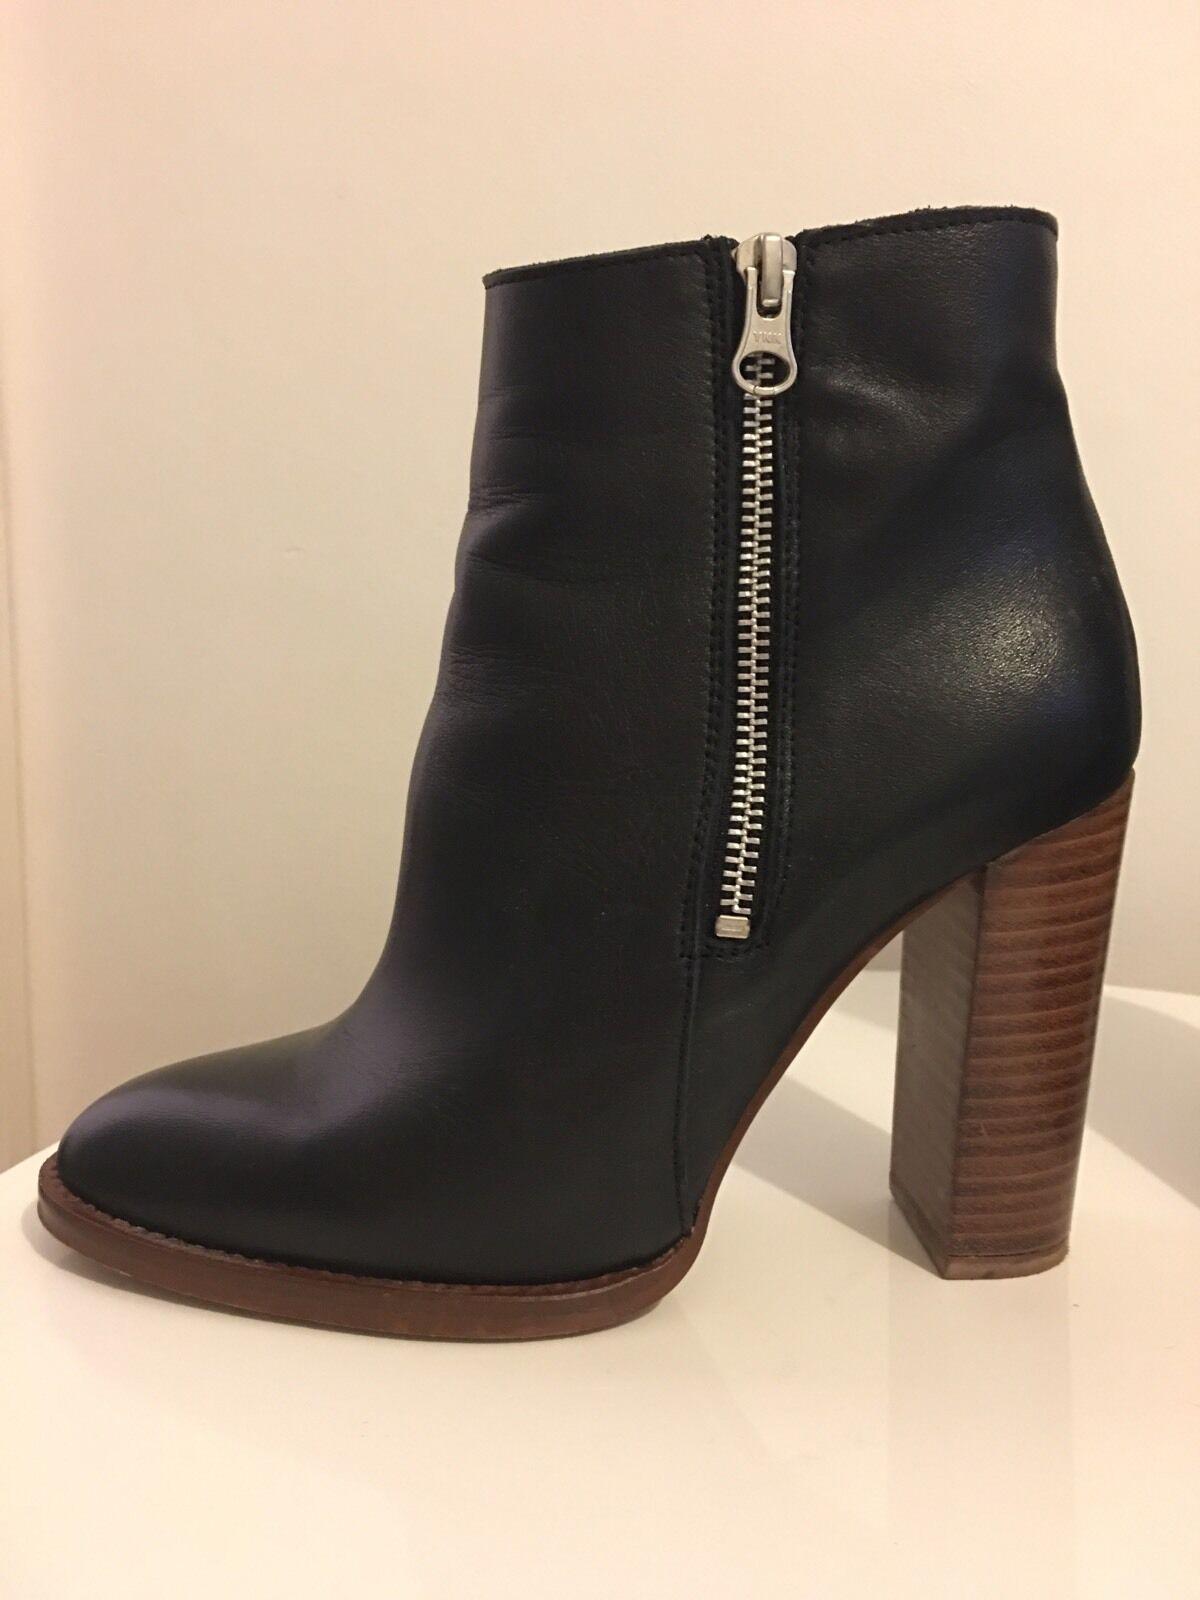 : HEEL WORN ONCE - OFFICE FRENZY BLACK LEATHER HIGH HEEL : ZIP Stiefel UK5 38 ef77c9